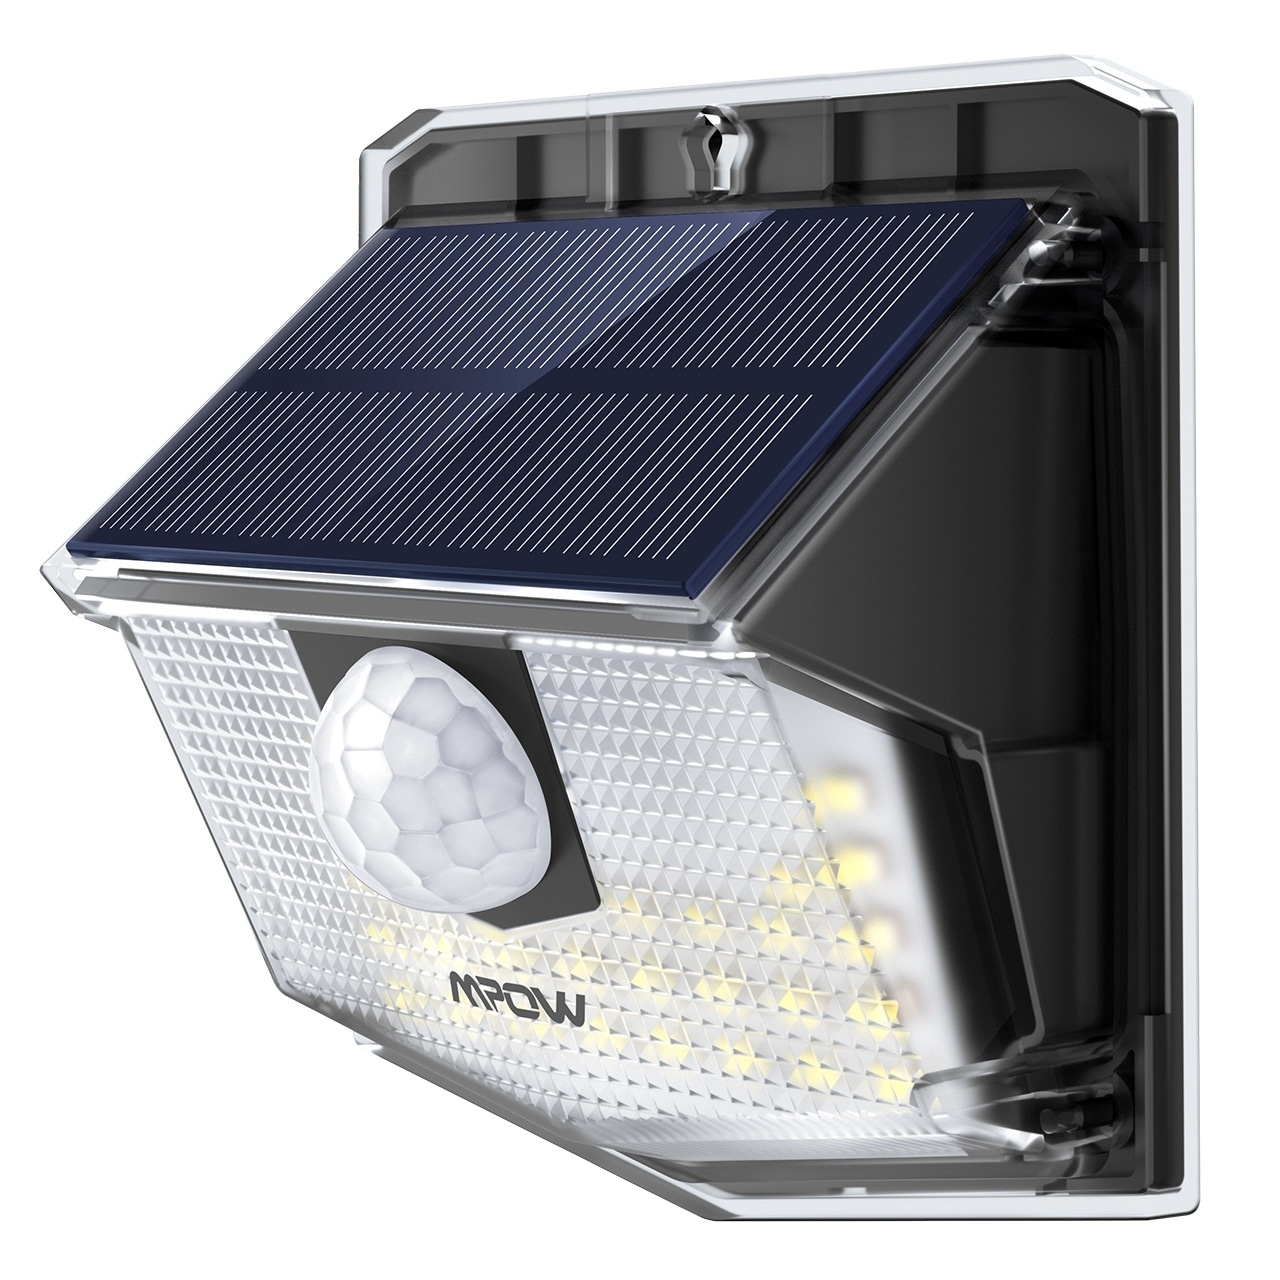 Shop Black Friday Deals On Mpow 30 Led Solar Lights Outdoor Motion Sensor Lights With 19 5 High Efficient Solar Panel Overstock 26478663